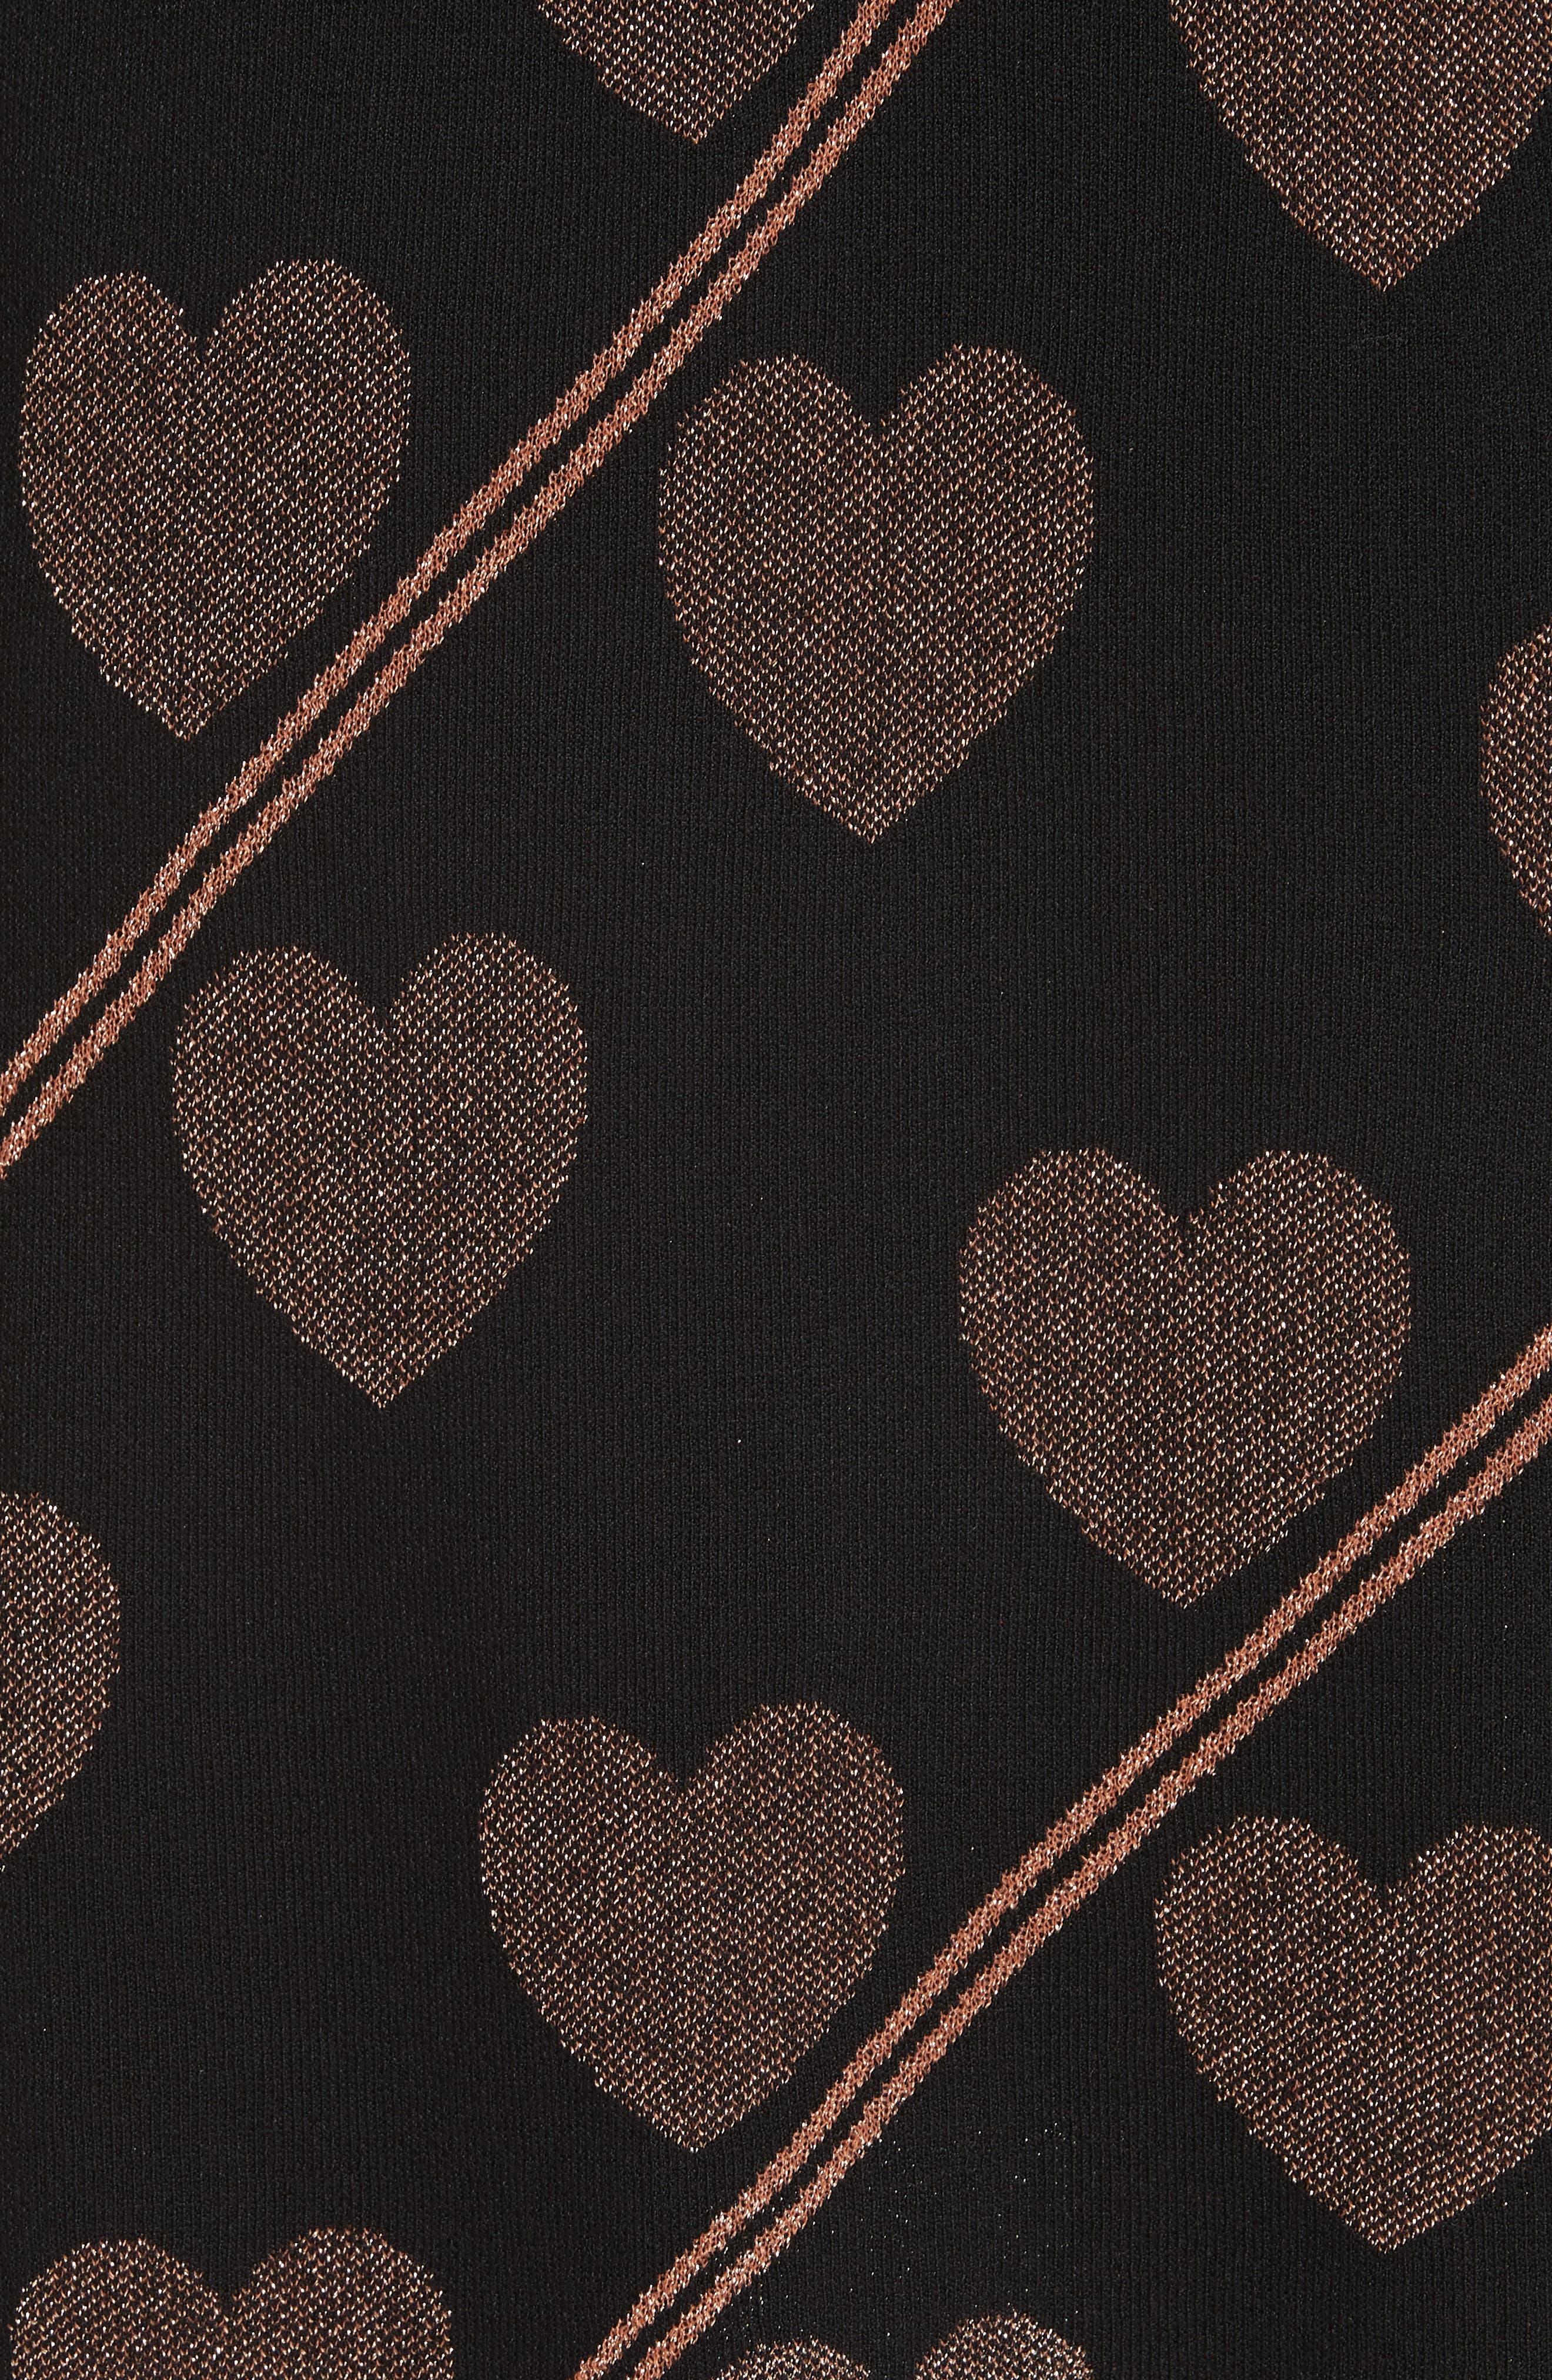 Uzeniaa Joyous Sweater Dress,                             Alternate thumbnail 5, color,                             BLACK